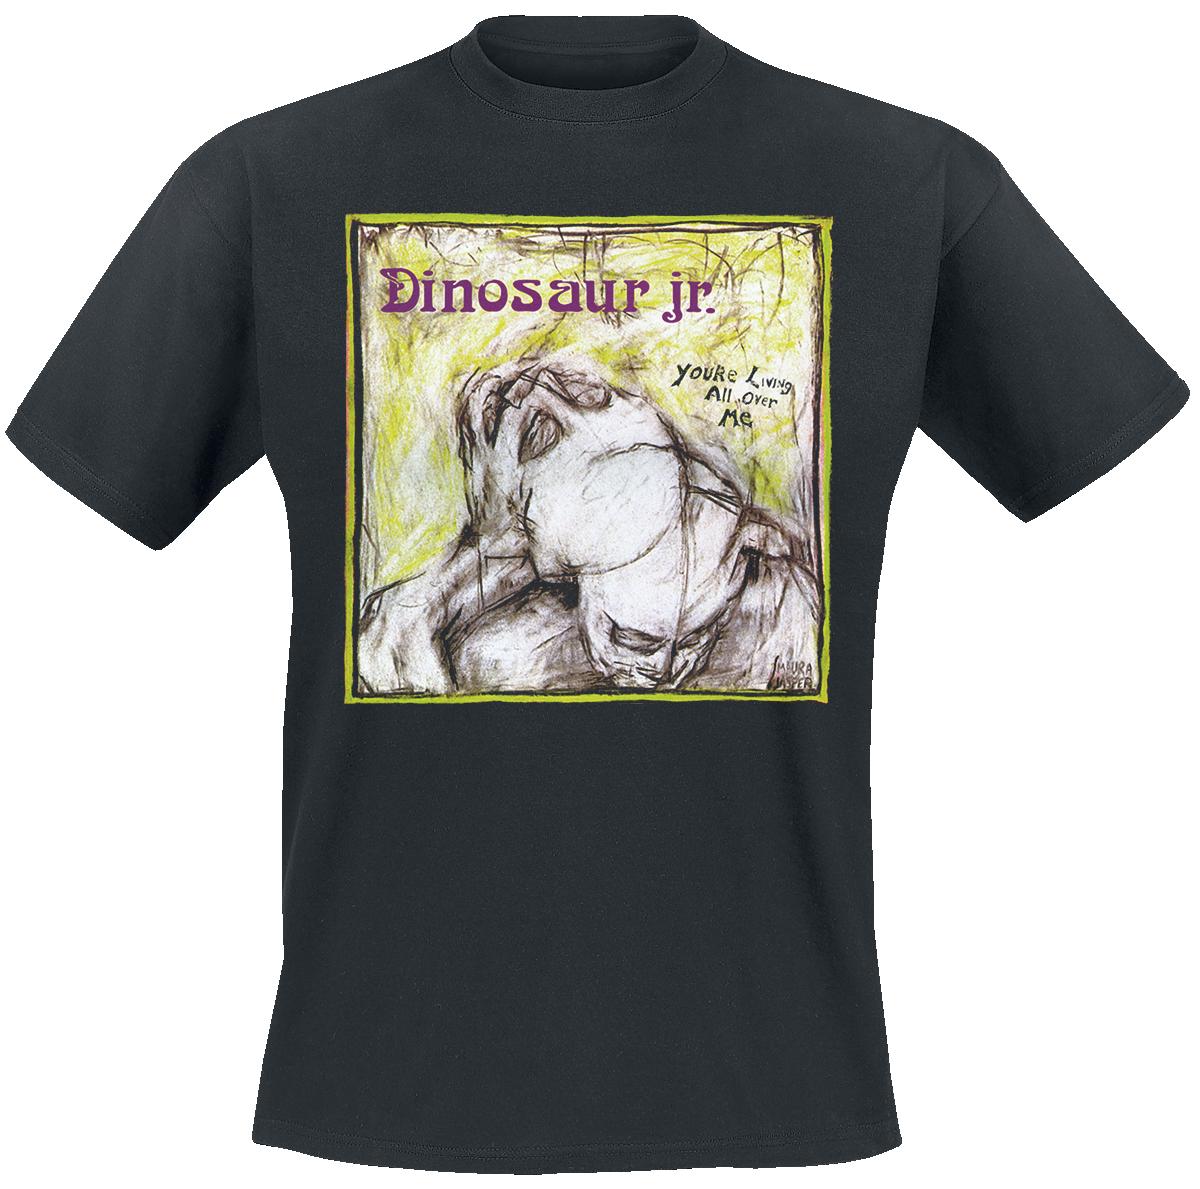 Dinosaur Jr. - You're Living All Over Me - T-Shirt - black image